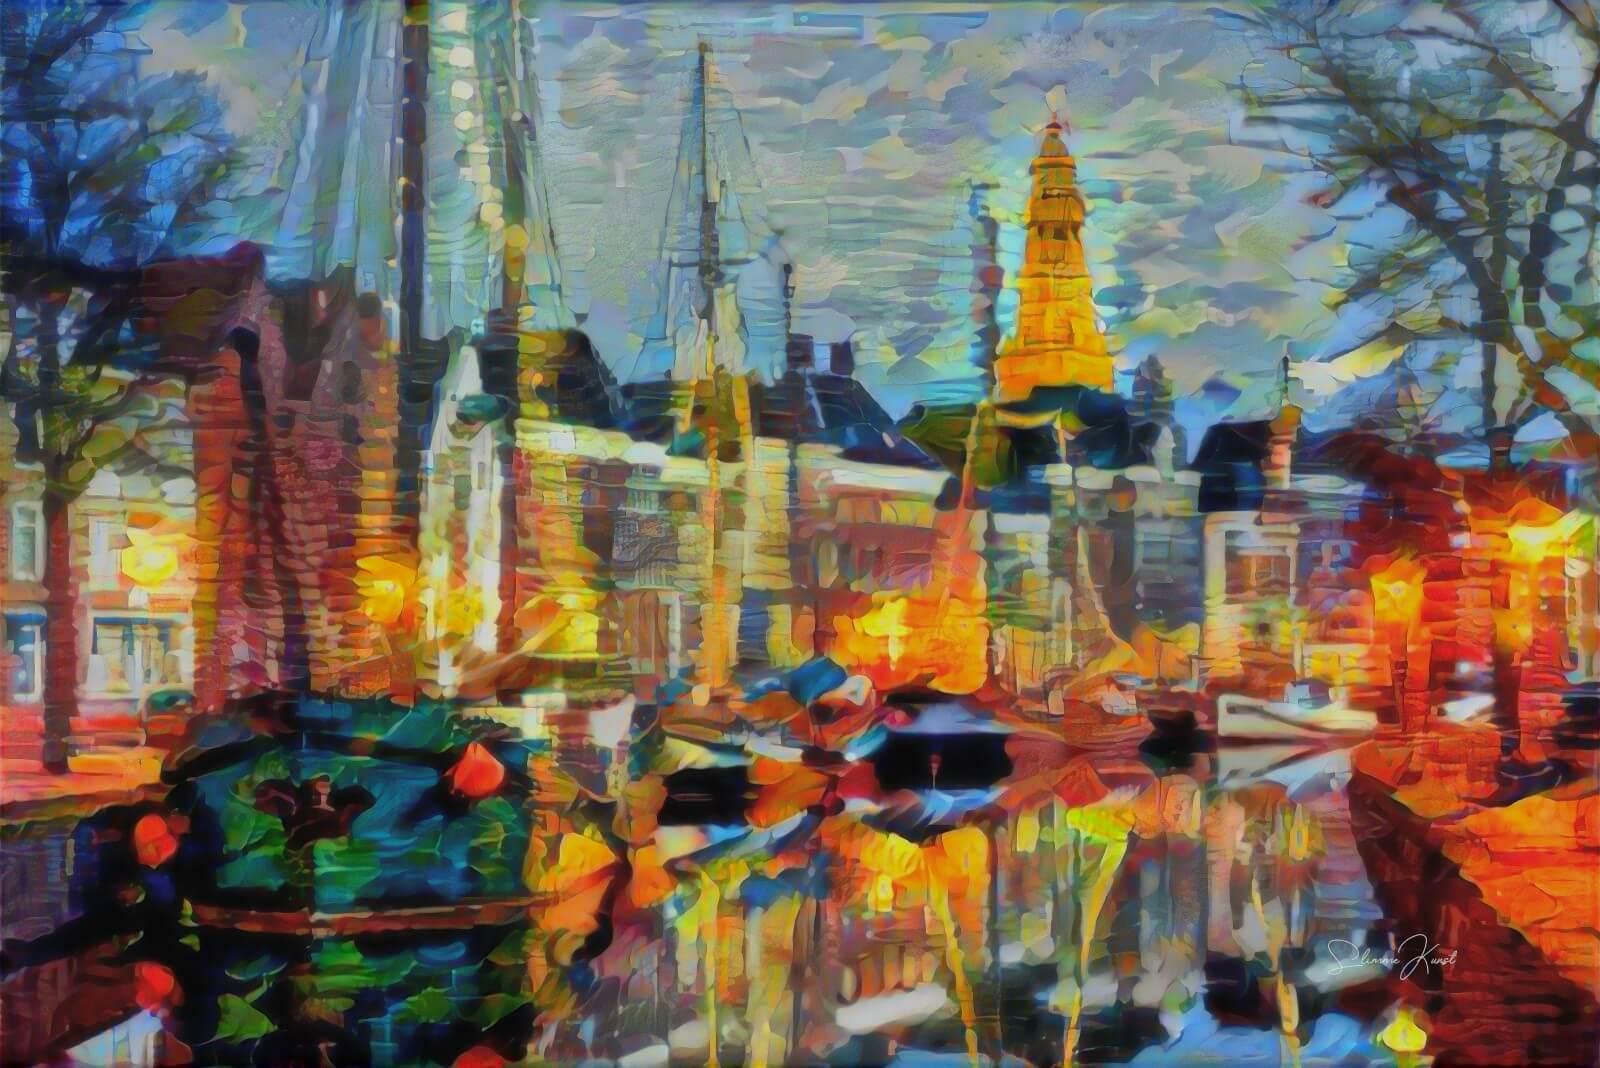 Abstract Schilderij Hoge der A Groningen